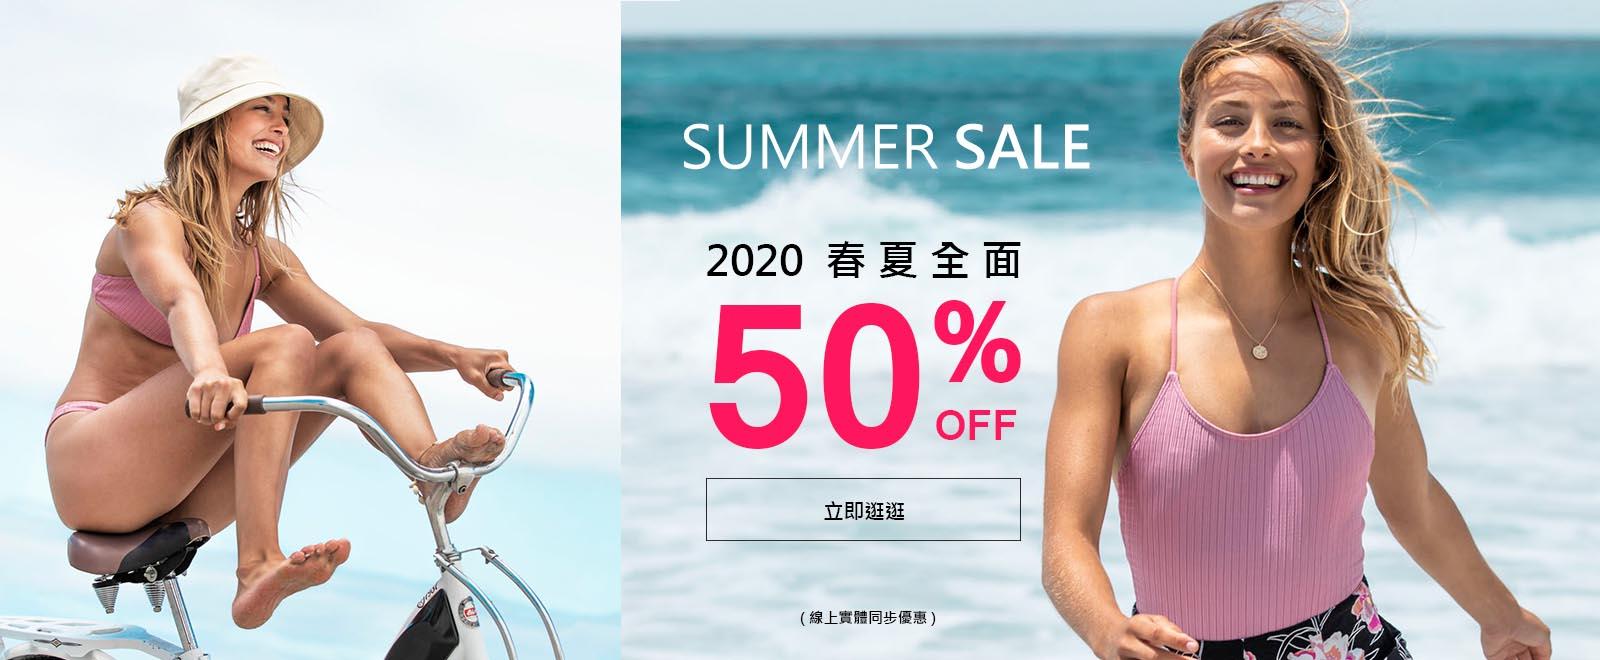 ROXY SUMMER SALE春夏商品全面五折!